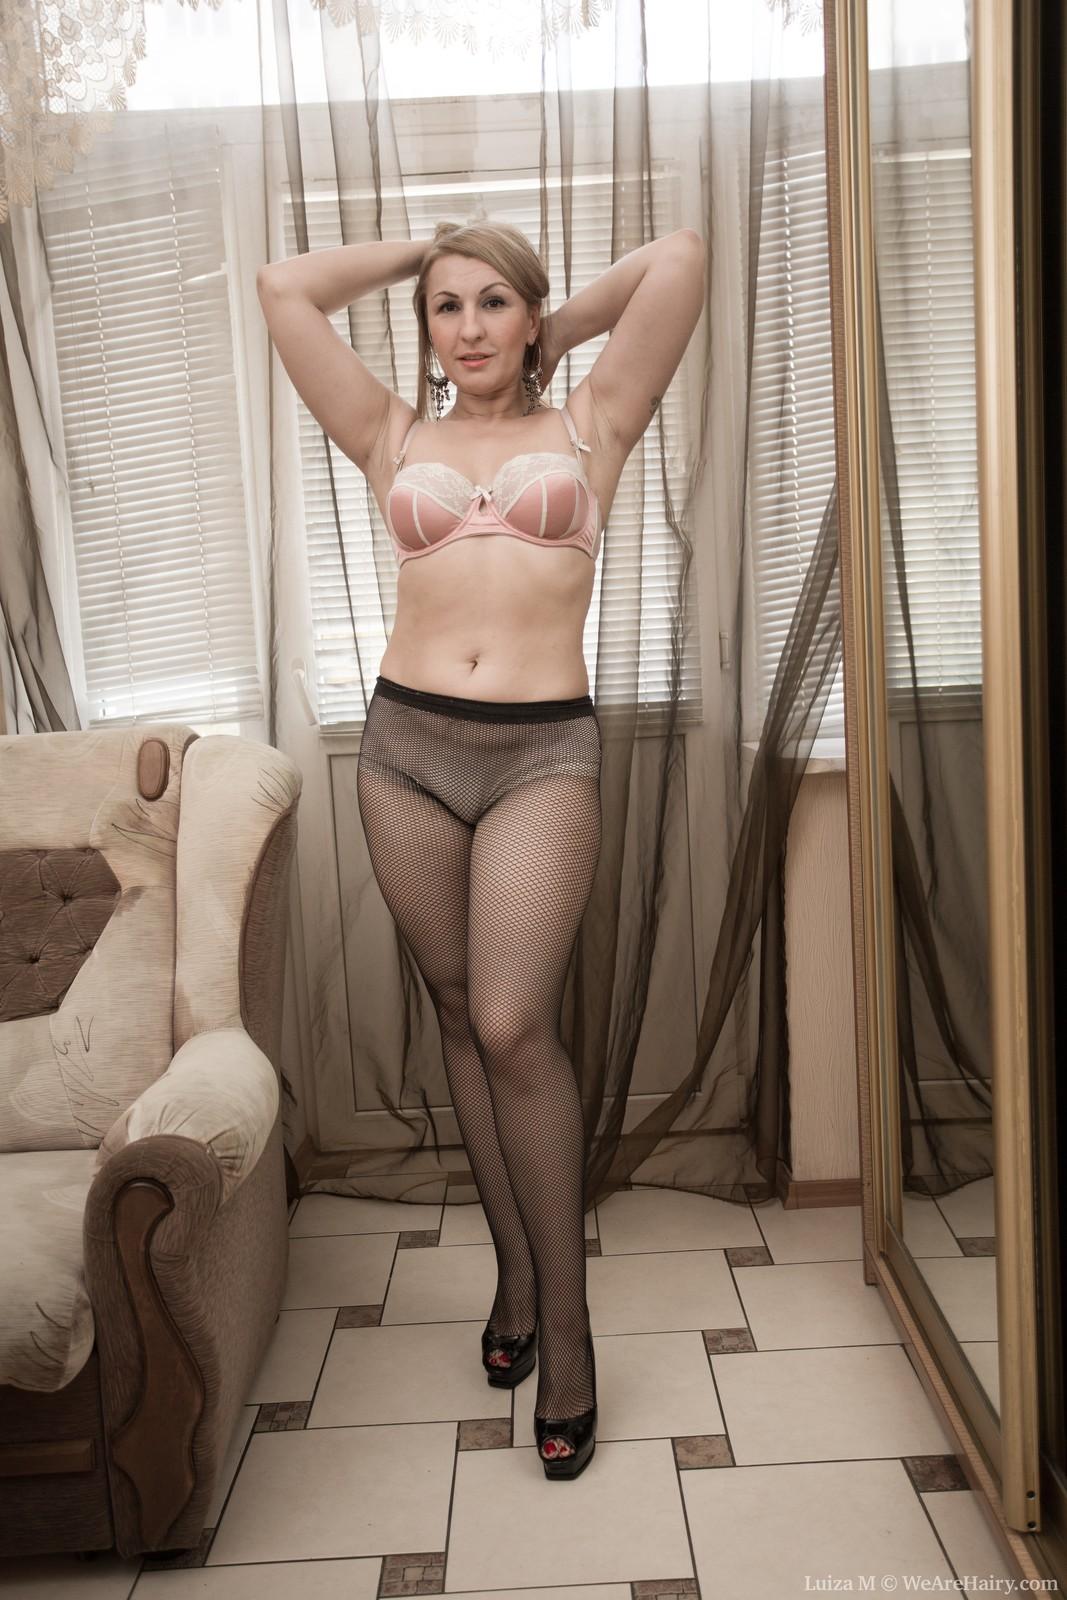 Sarah ftv girl nude